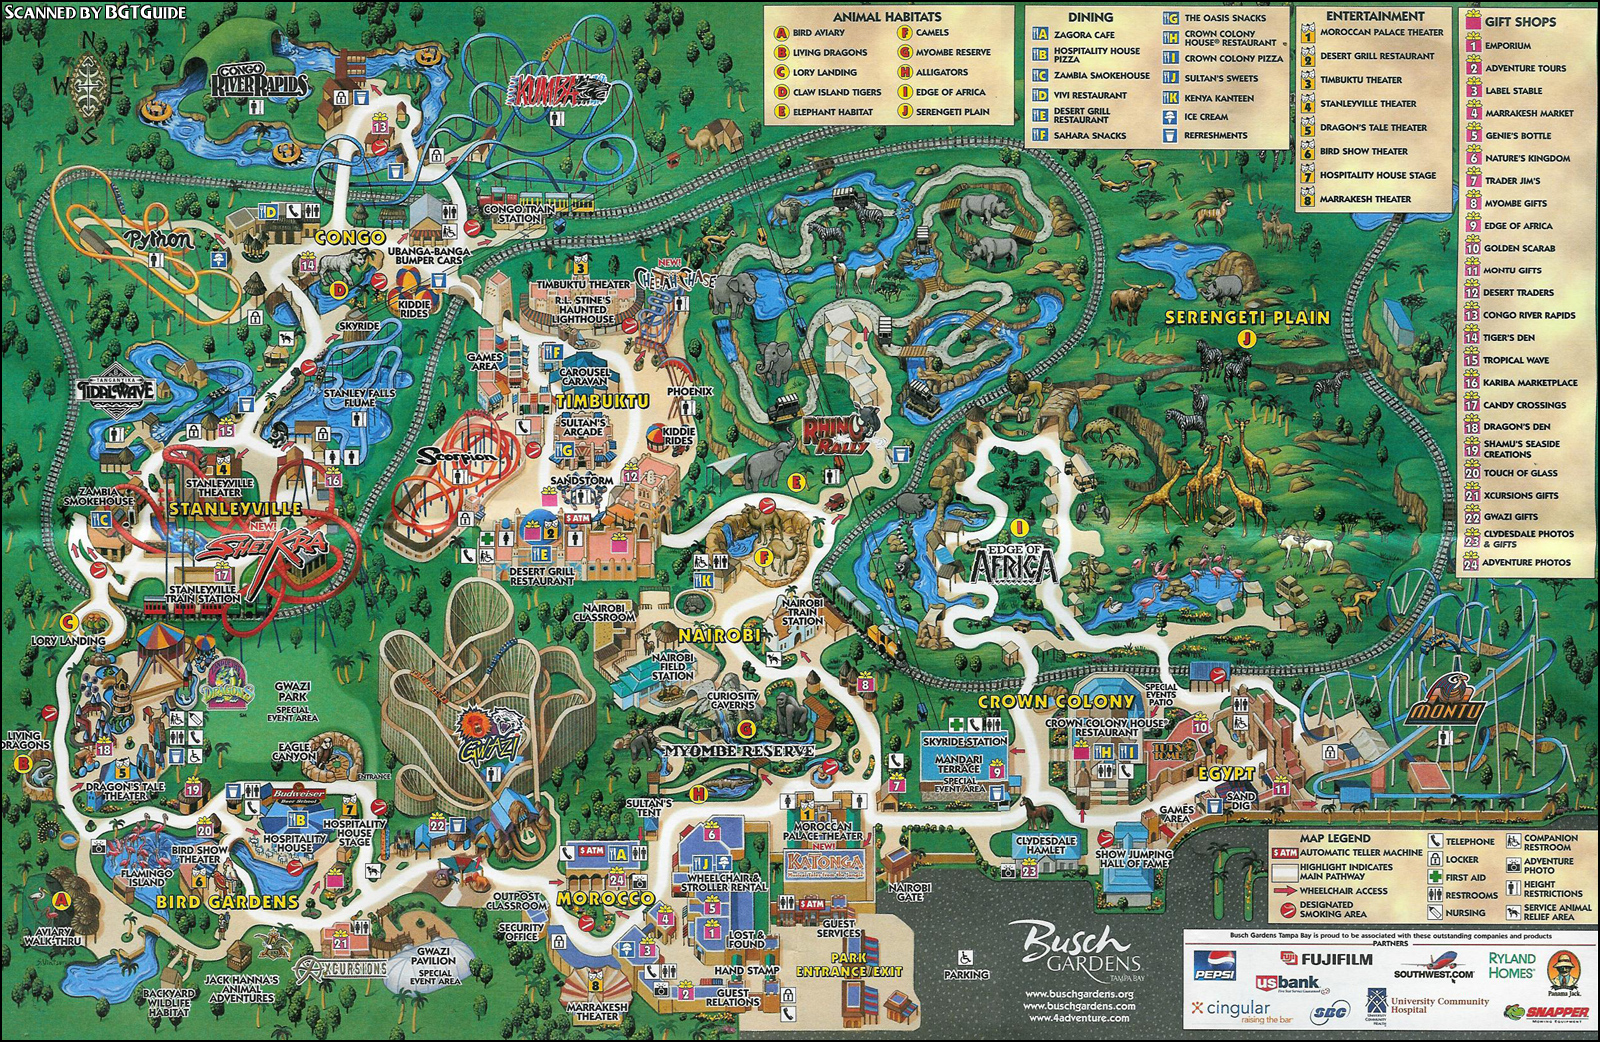 Busch Gardens Tampa Fl Central Florida Entertainment Busch